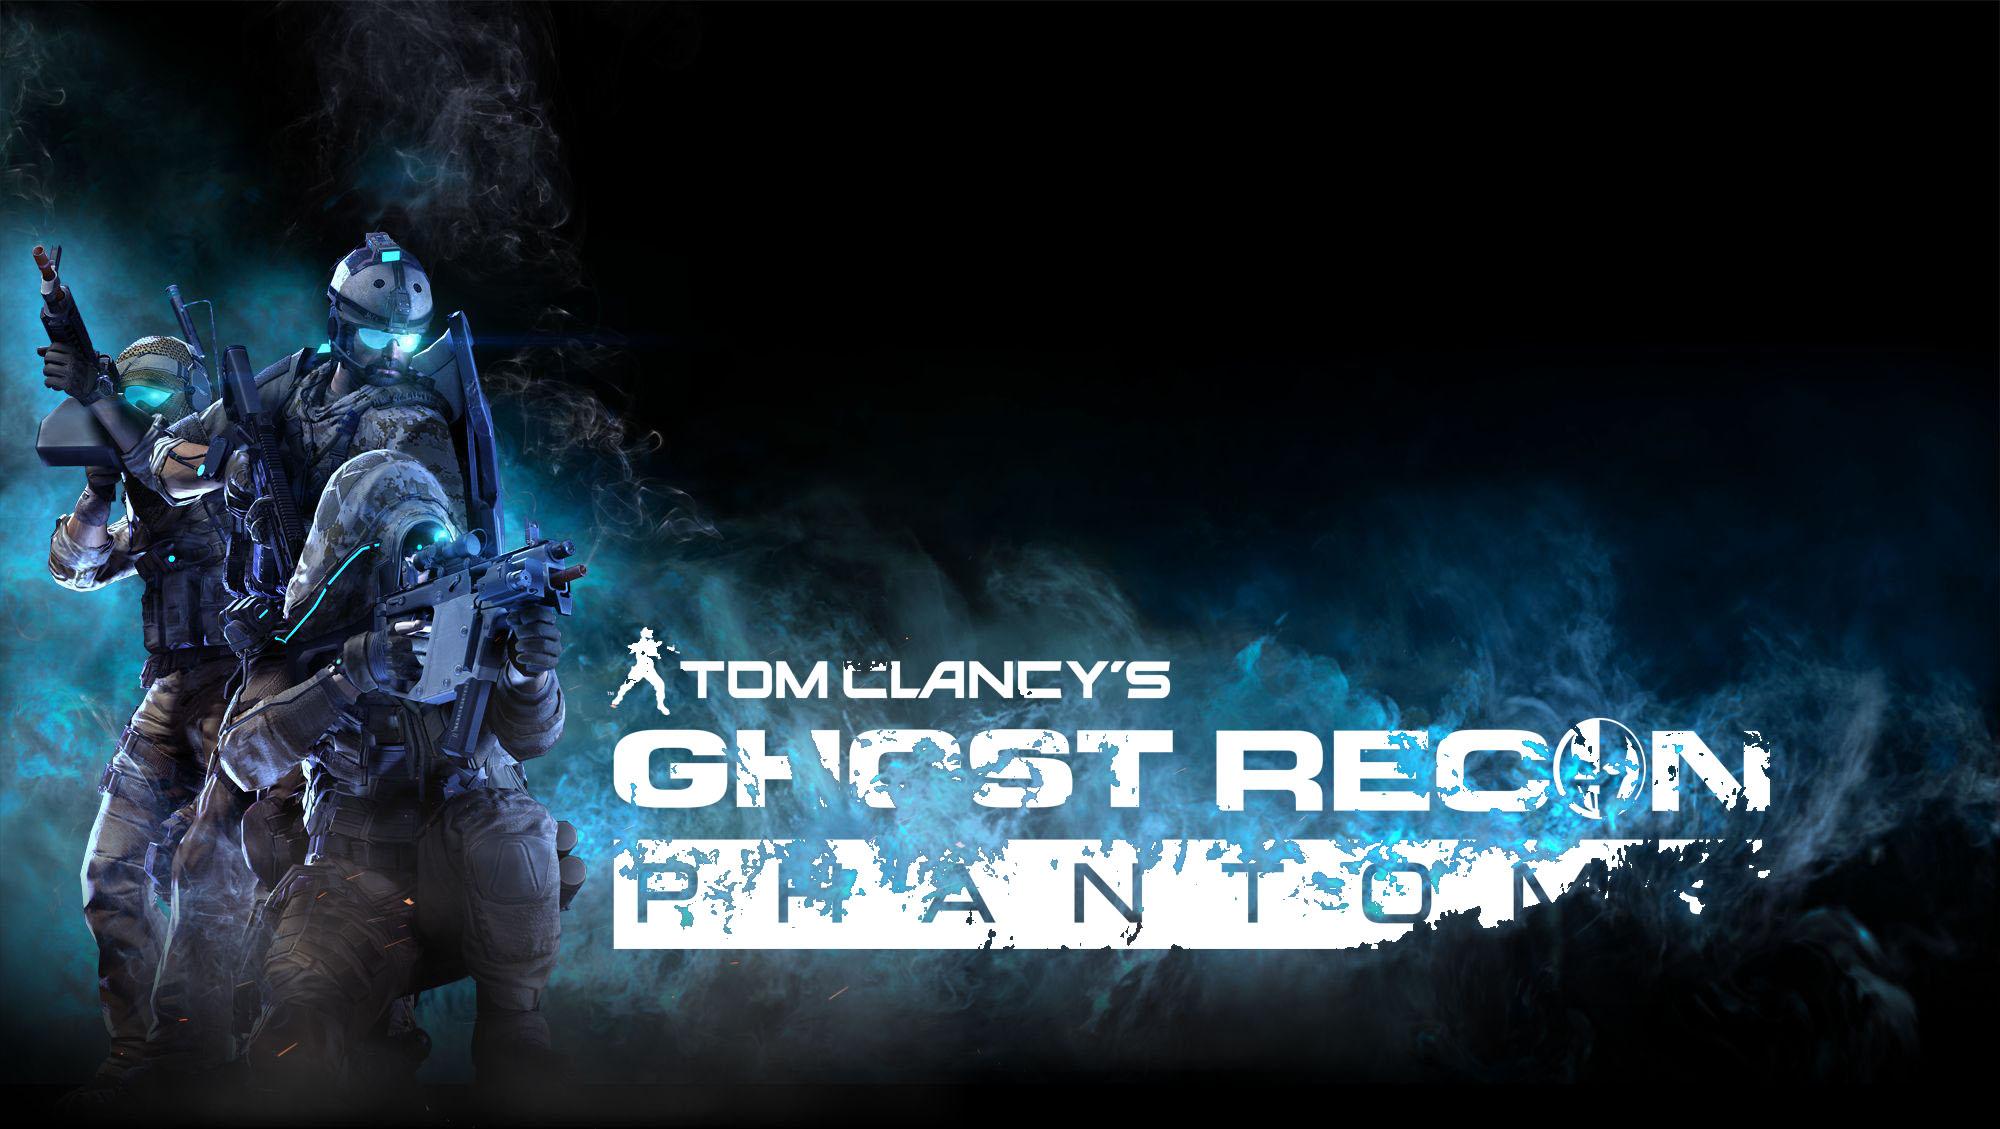 Tom Clancys Ghost Recon Phantoms Wallpaper by RajivCR7 2000x1129